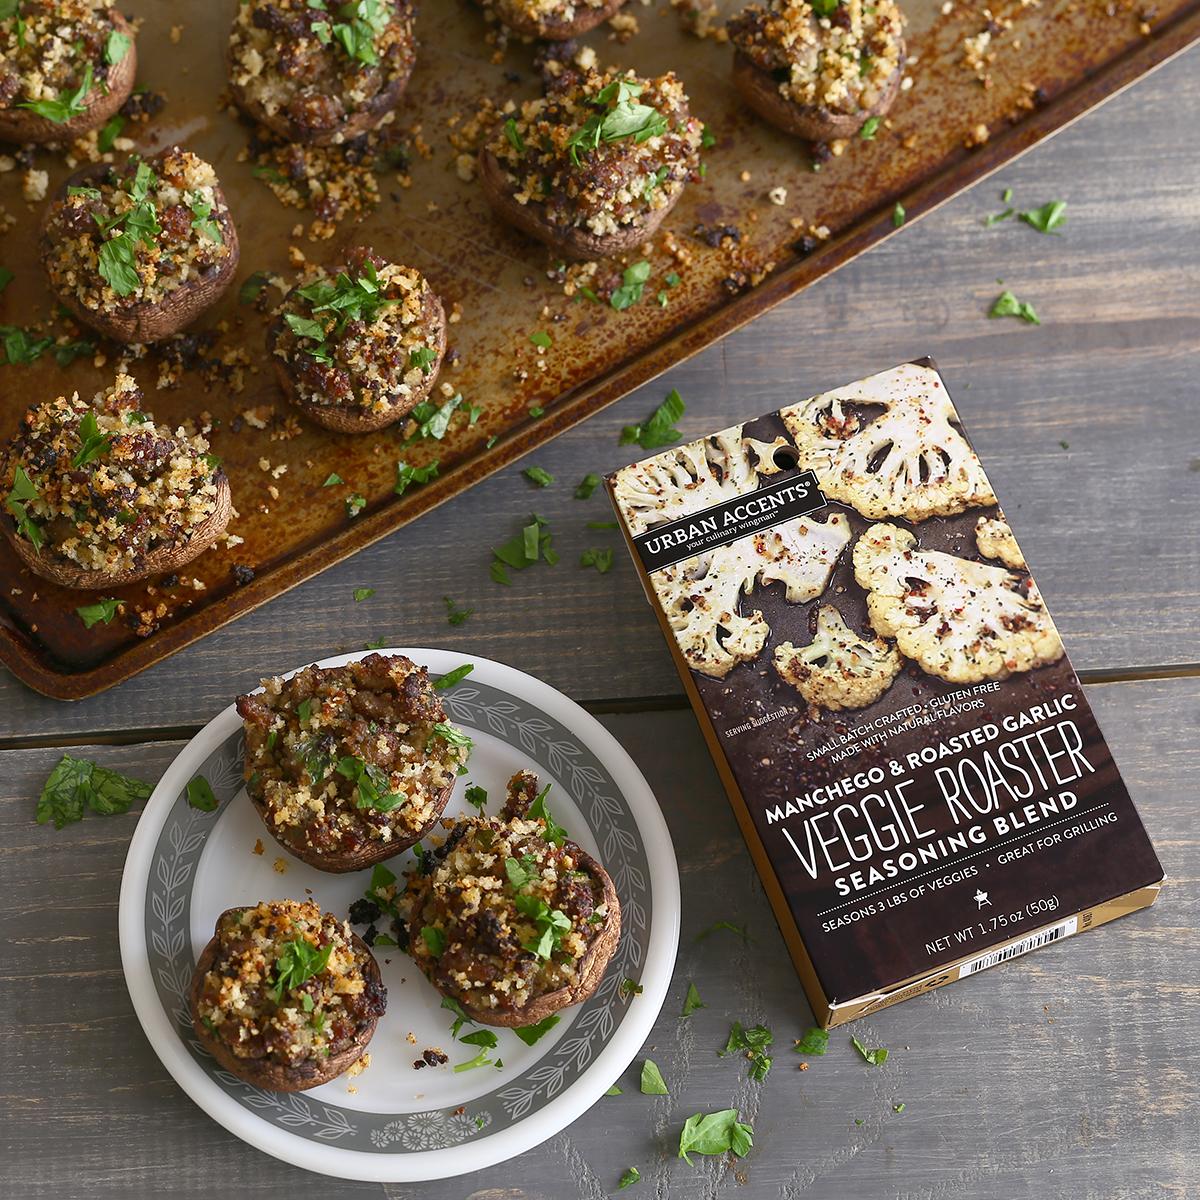 Manchego and Sausage Stuffed Mushrooms Recipe via Kara's Party Ideas